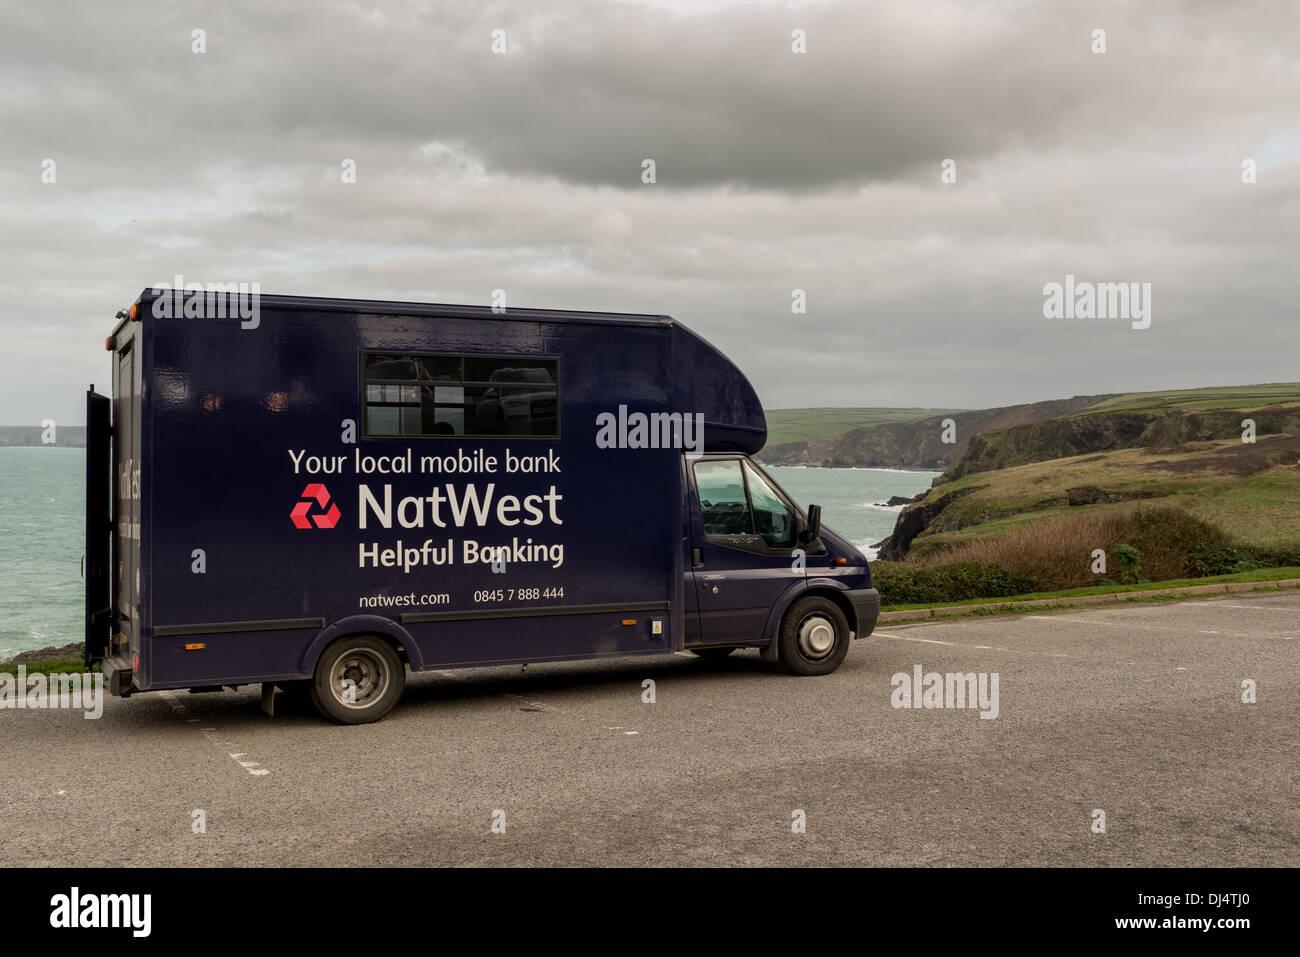 Mobile banking van in Cornwall - Stock Image